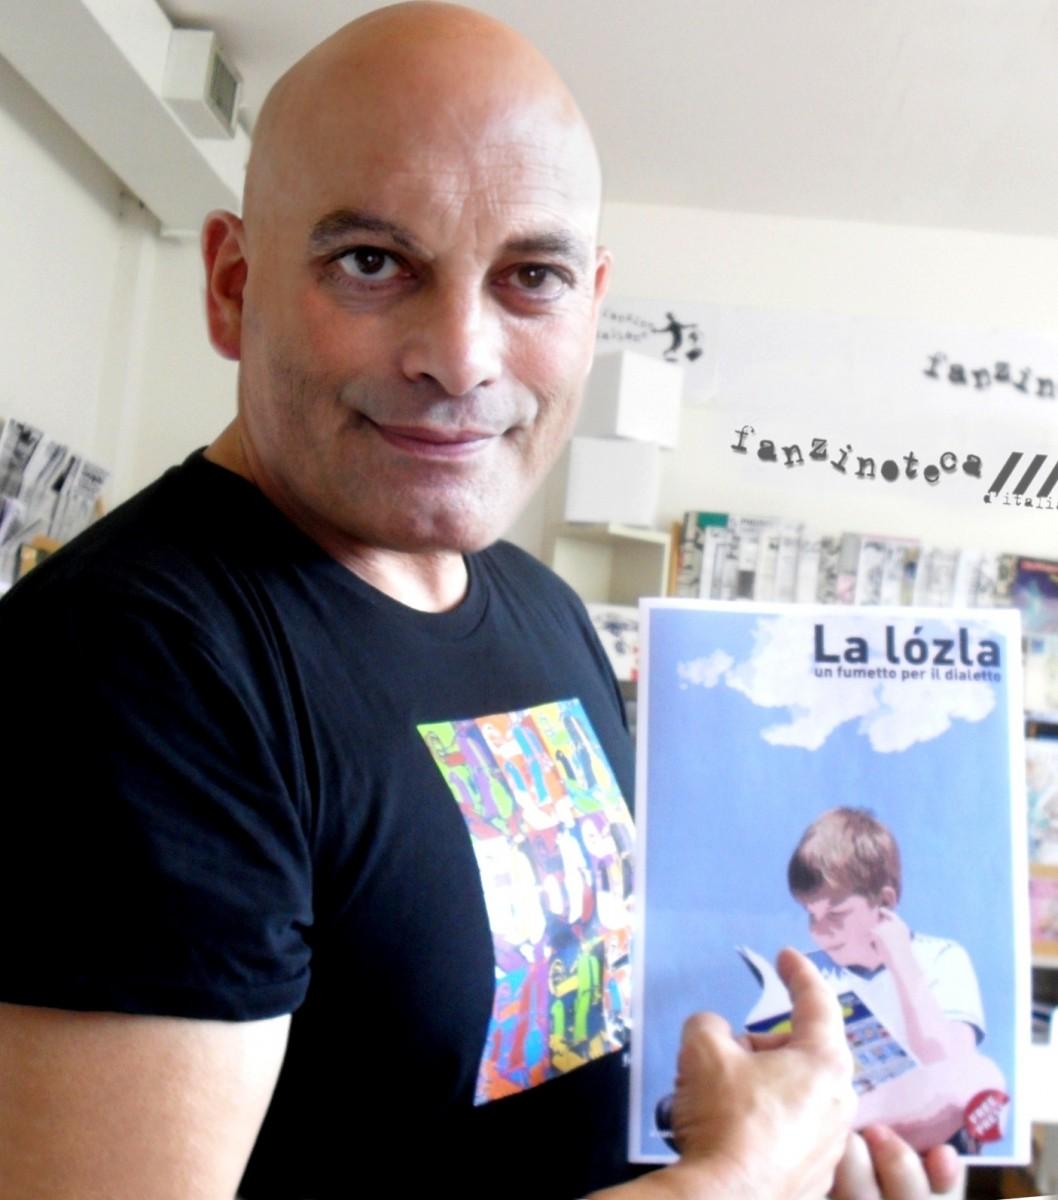 Fanzinoteca d'Italia l'Esperto Fanzinotecario Gianluca Umiliacchi con La lòzla